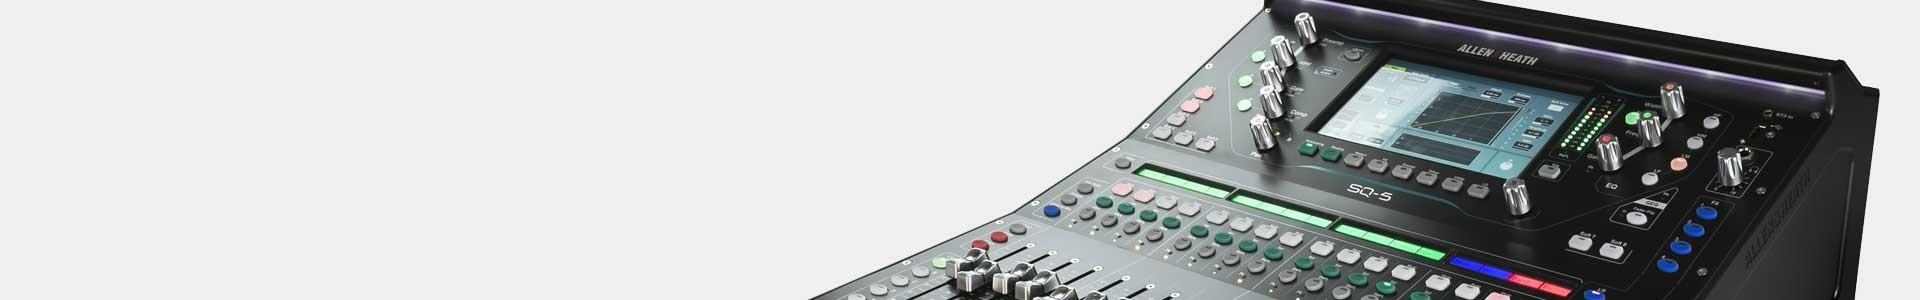 Allen & Heath - Avacab Audiovisuales